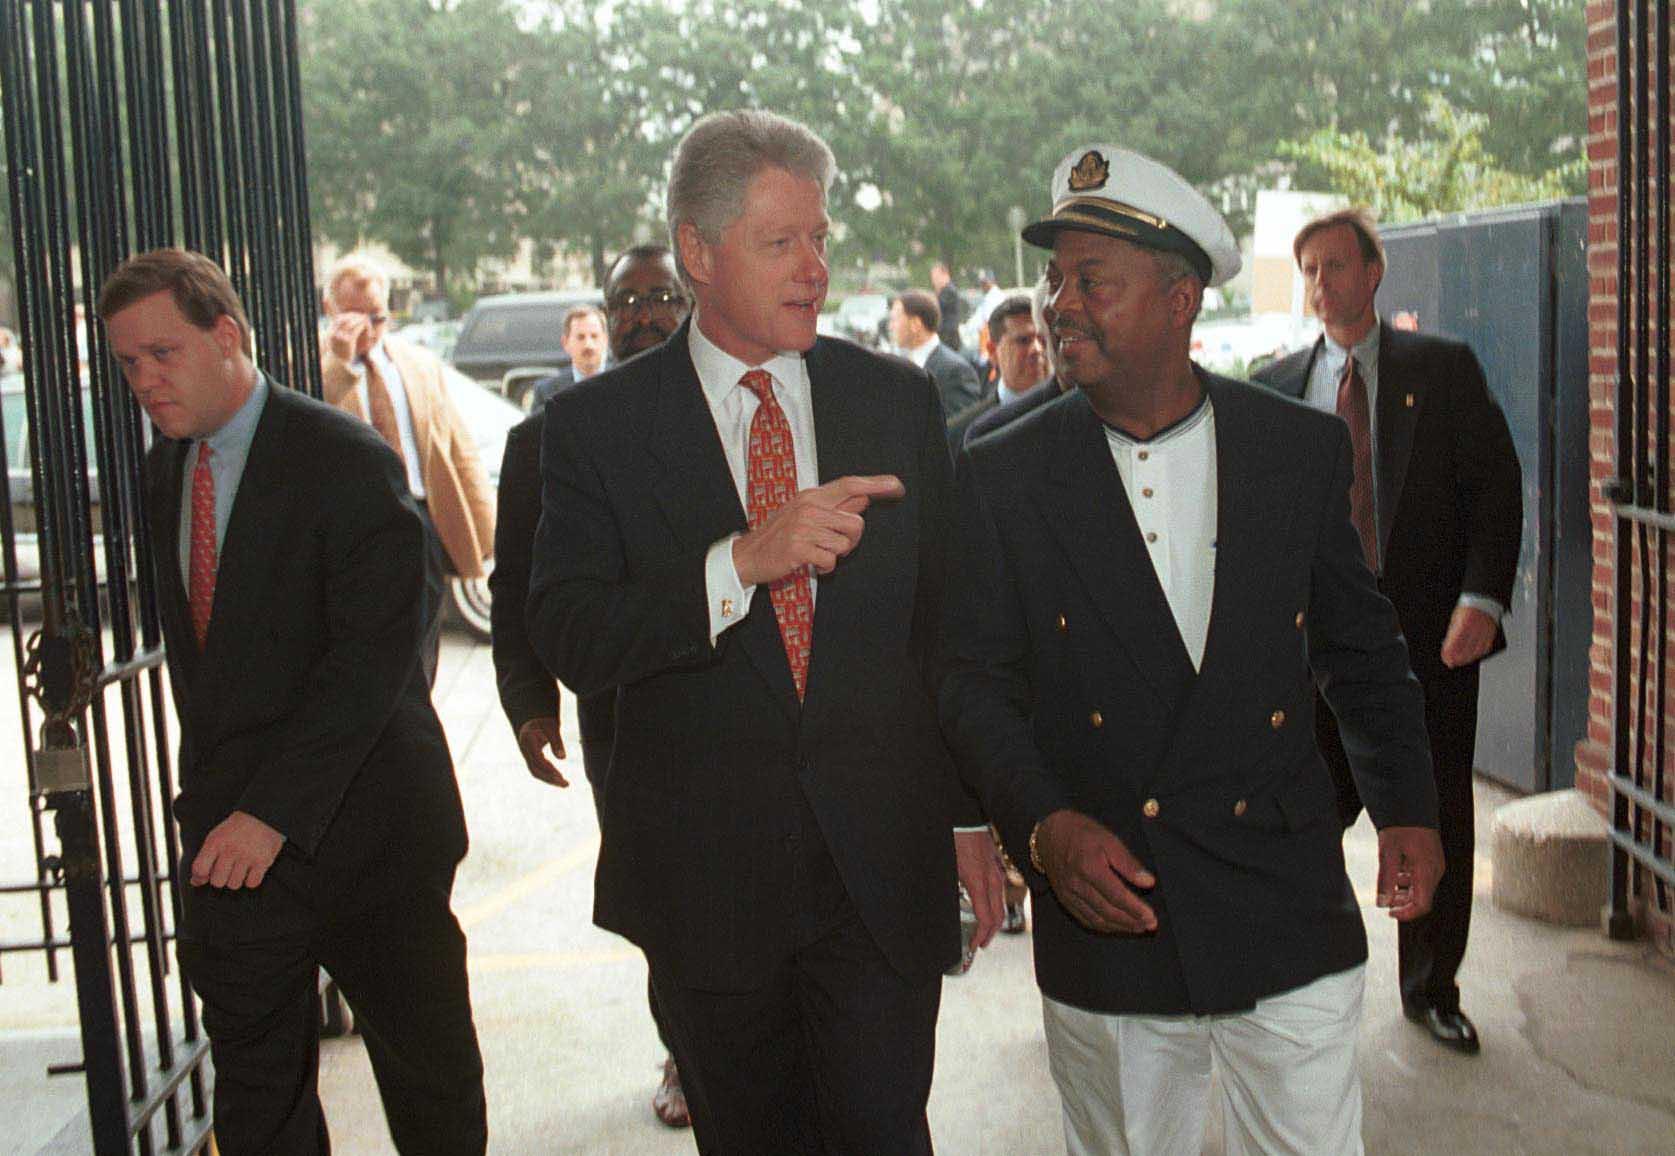 Mr. Clinton and Congressman Payne.jpg